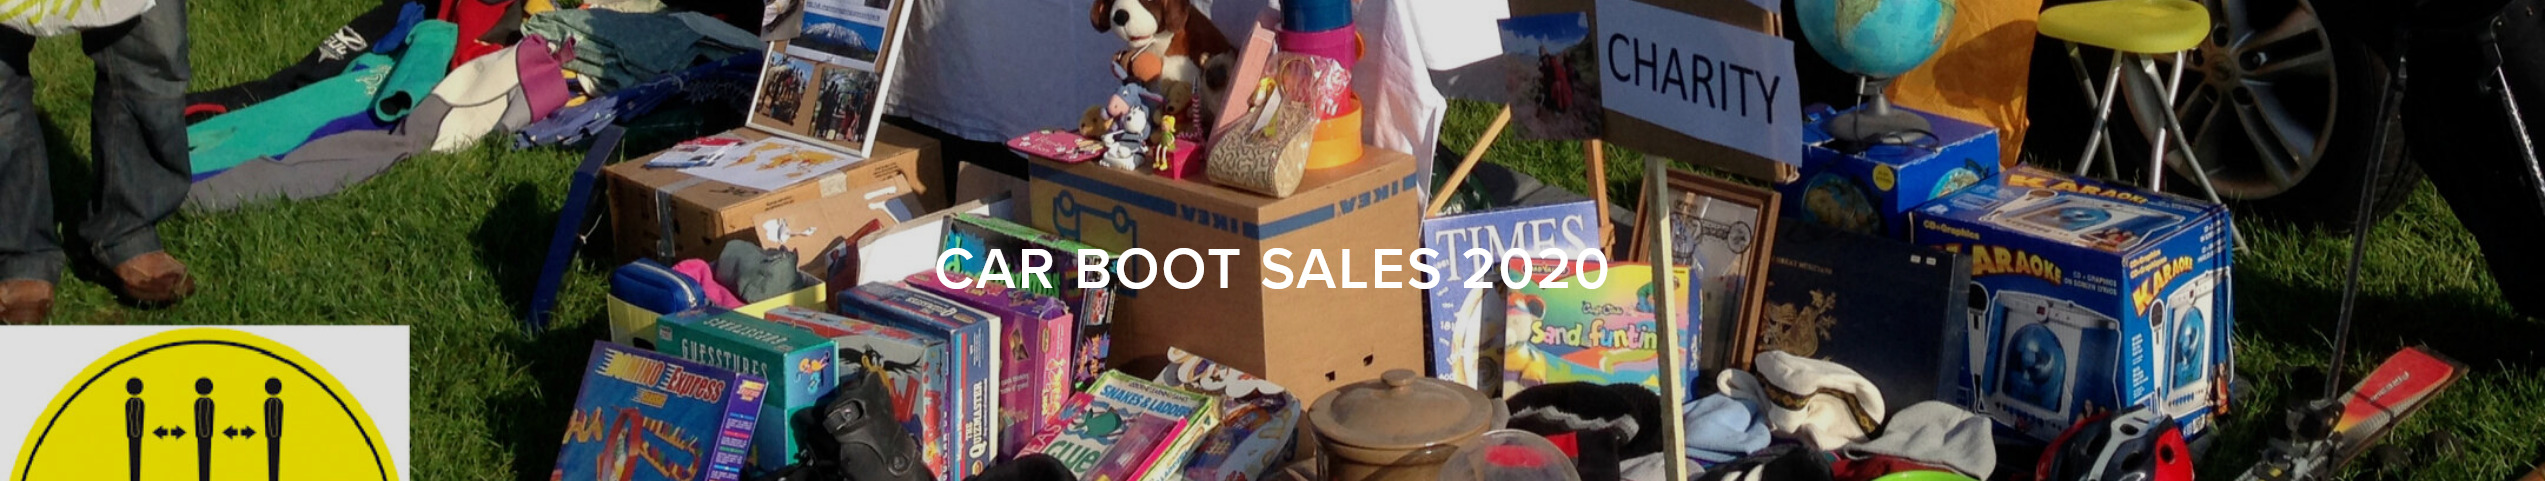 Cranleigh Car Boot Sale 2020